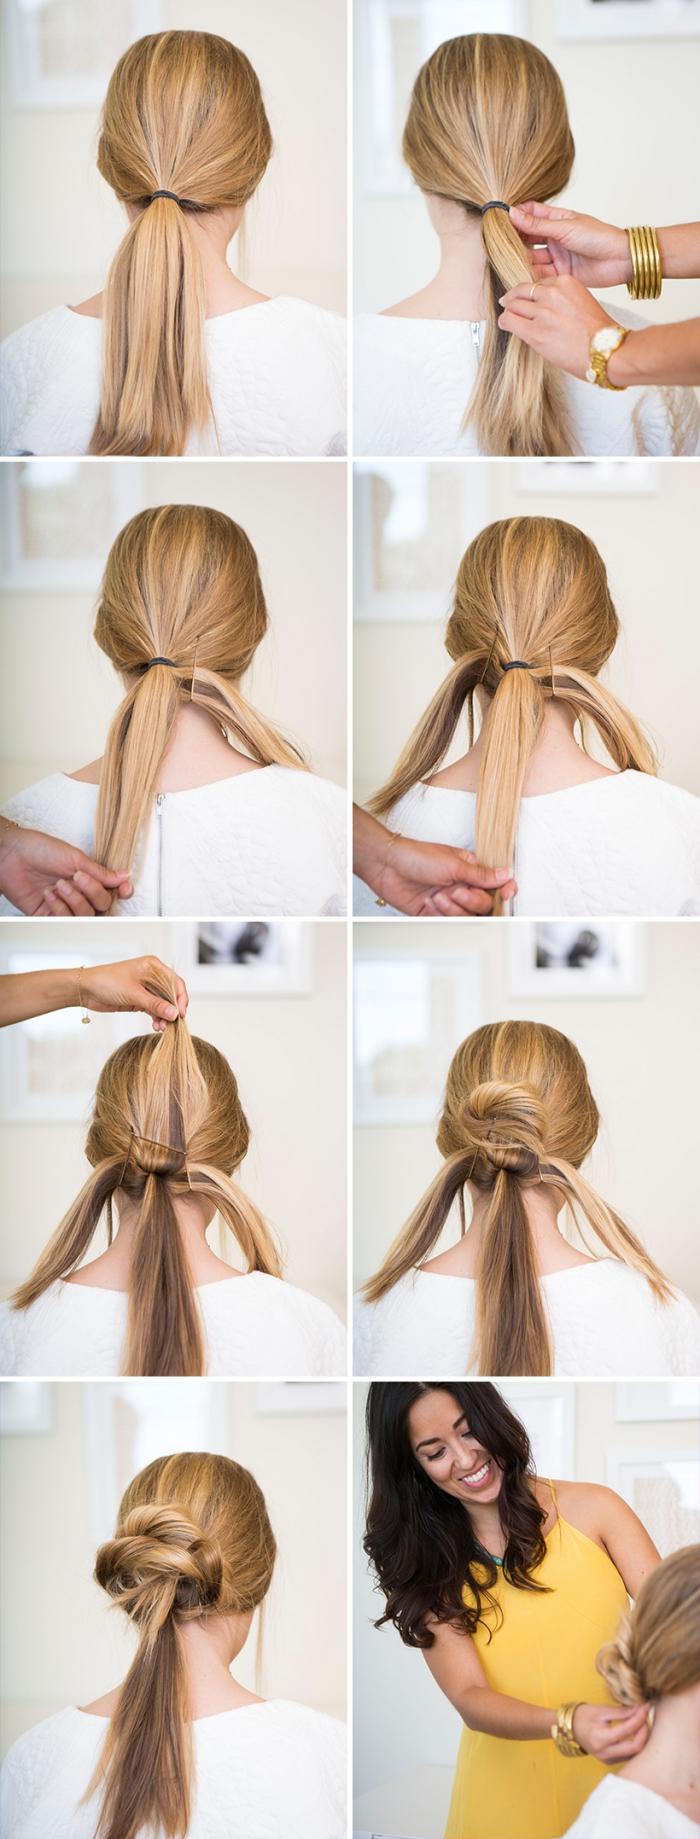 1001 Ideen Fur Schone Haarfrisuren Plus Anleitungen Zum